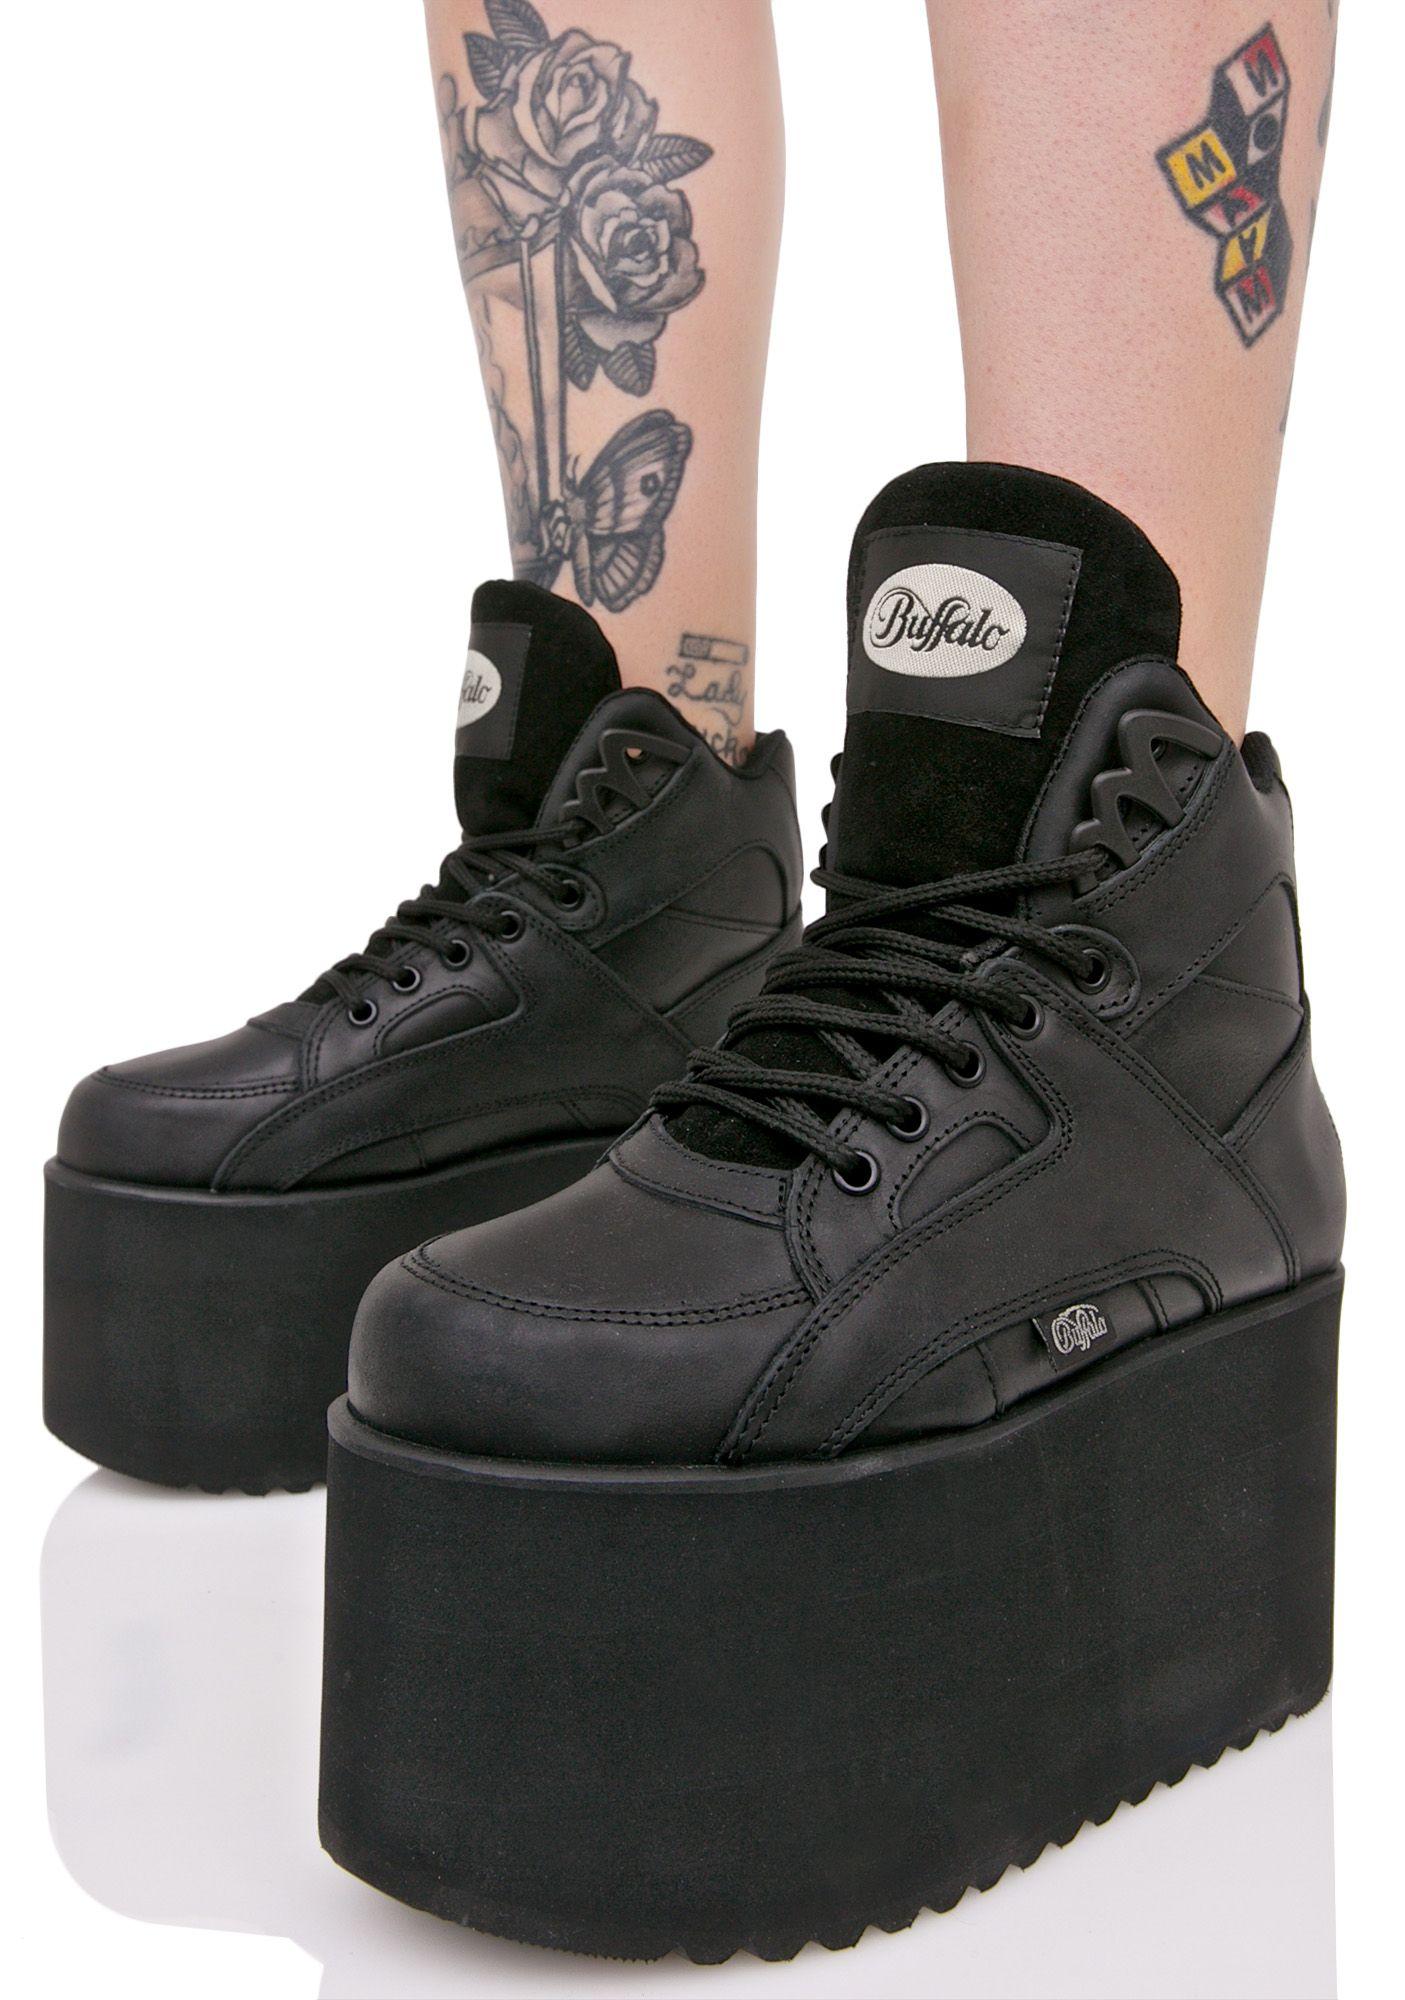 33973bf2363 BUFFALO TEXAS BLACK LEATHER PLATFORM SNEAKERS - I Want It Black